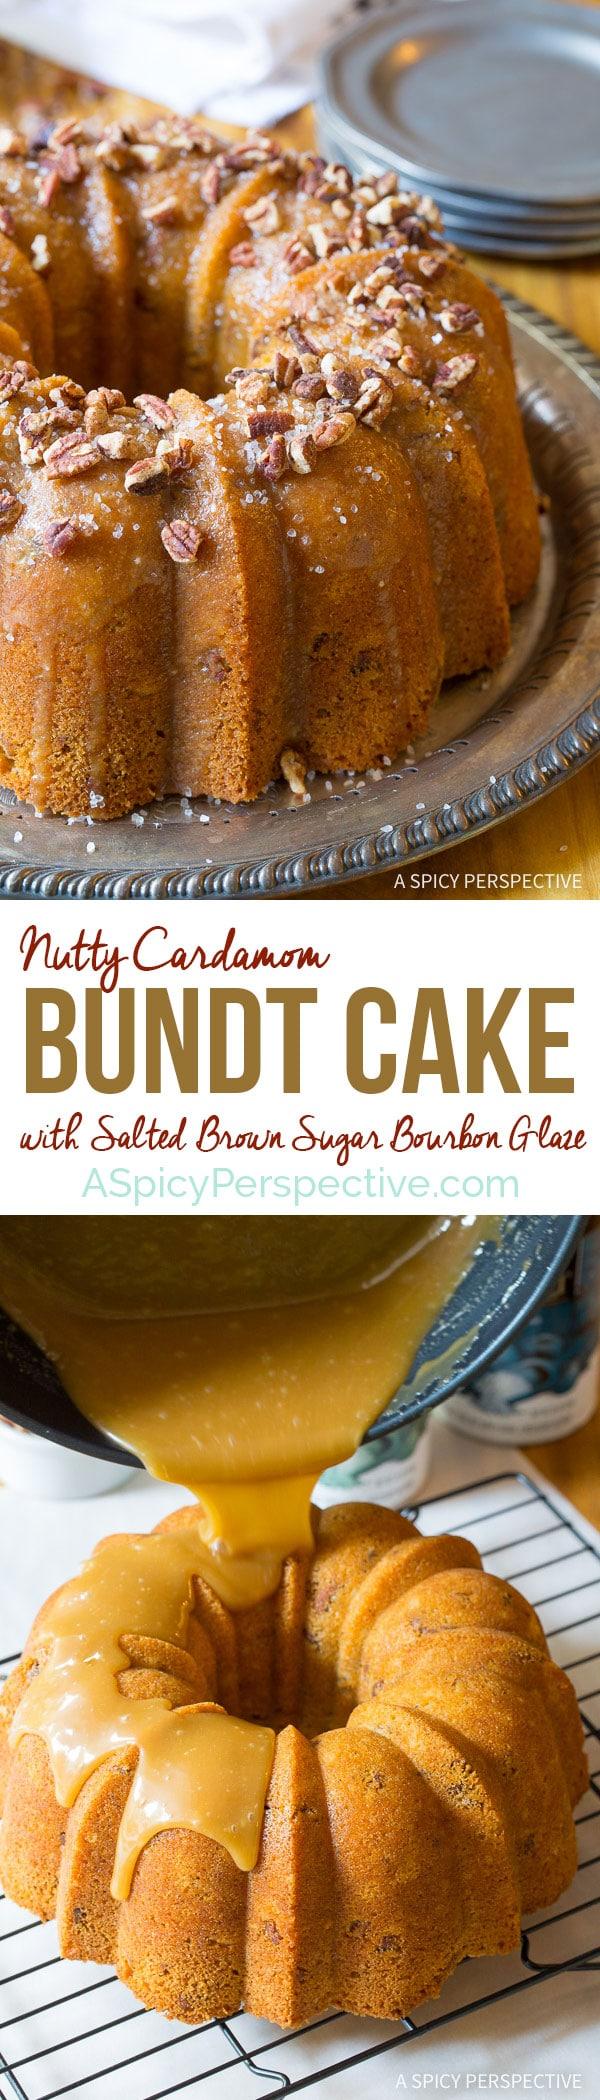 Crazy over this Nutty Cardamom Bundt Cake with Bourbon Glaze on ASpicyPerspective.com